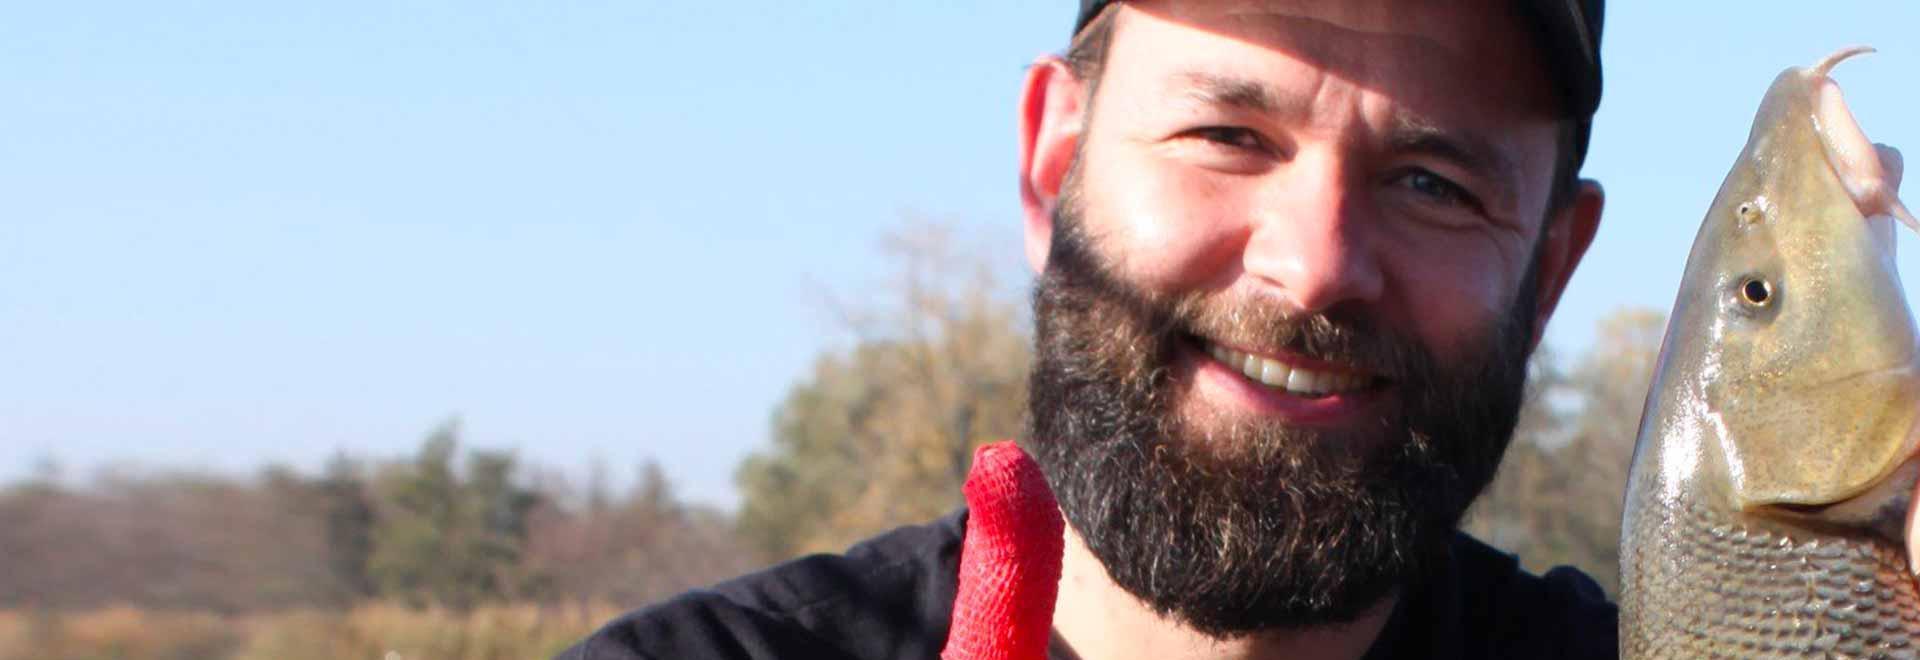 Grossi barbi in acque veloci